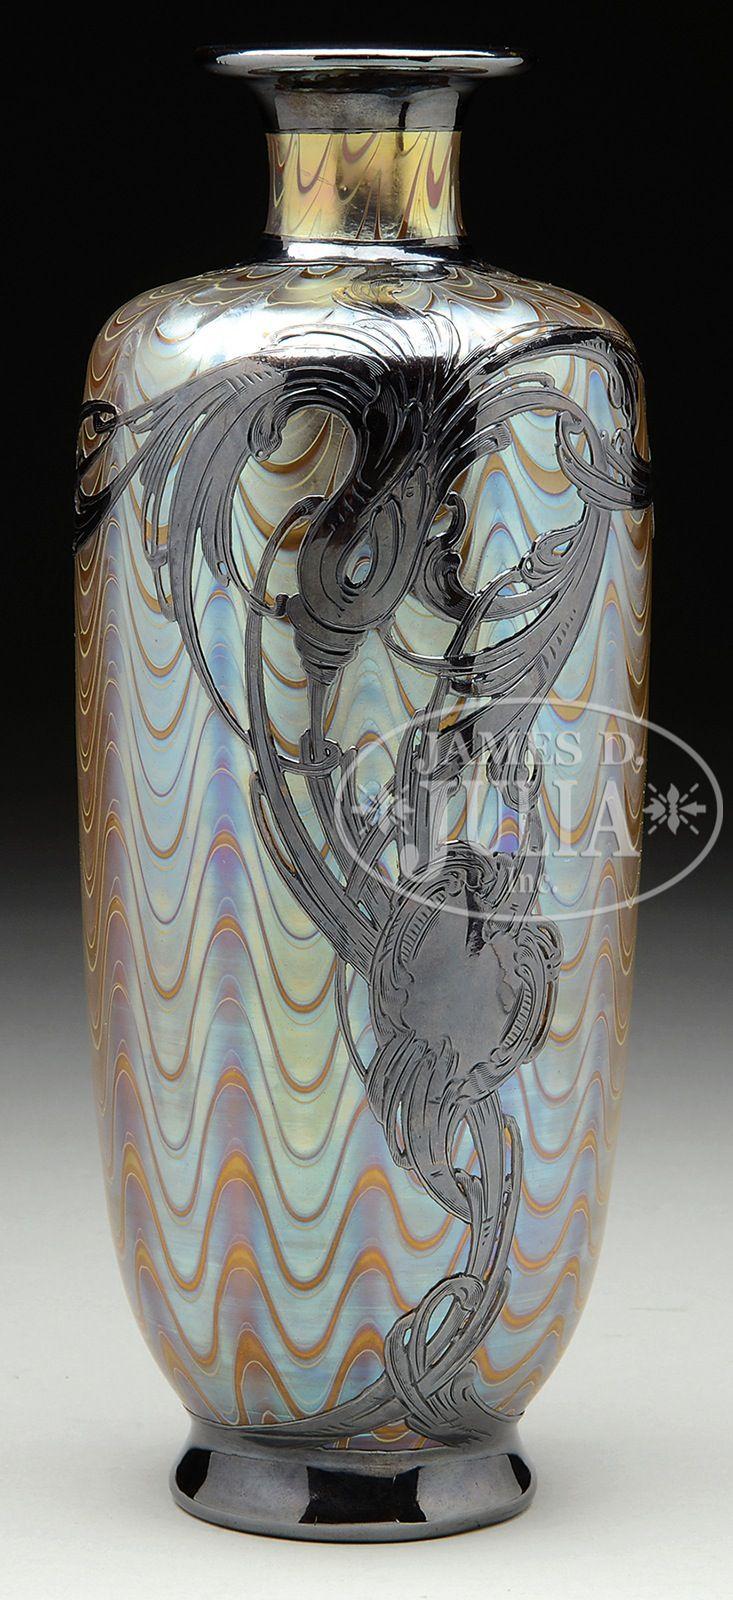 668 best art nouveau vases loetz images on pinterest art nouveau loetz silver overlay vase loetz vase in the phaenomen genre has platinum iridescent wavy bands reviewsmspy